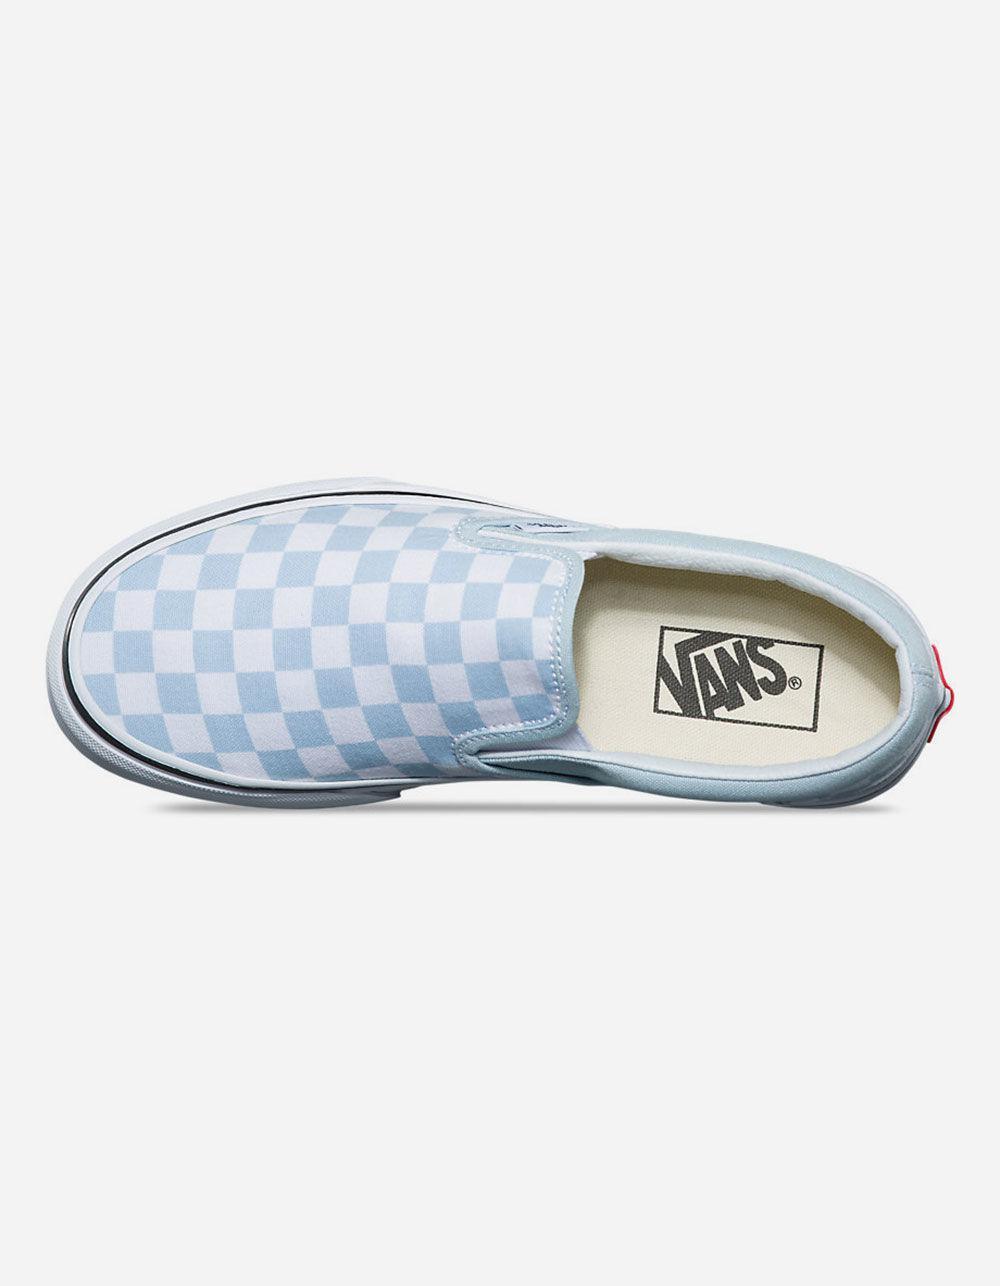 Checkerboard Baby Blue Womens Slip-on